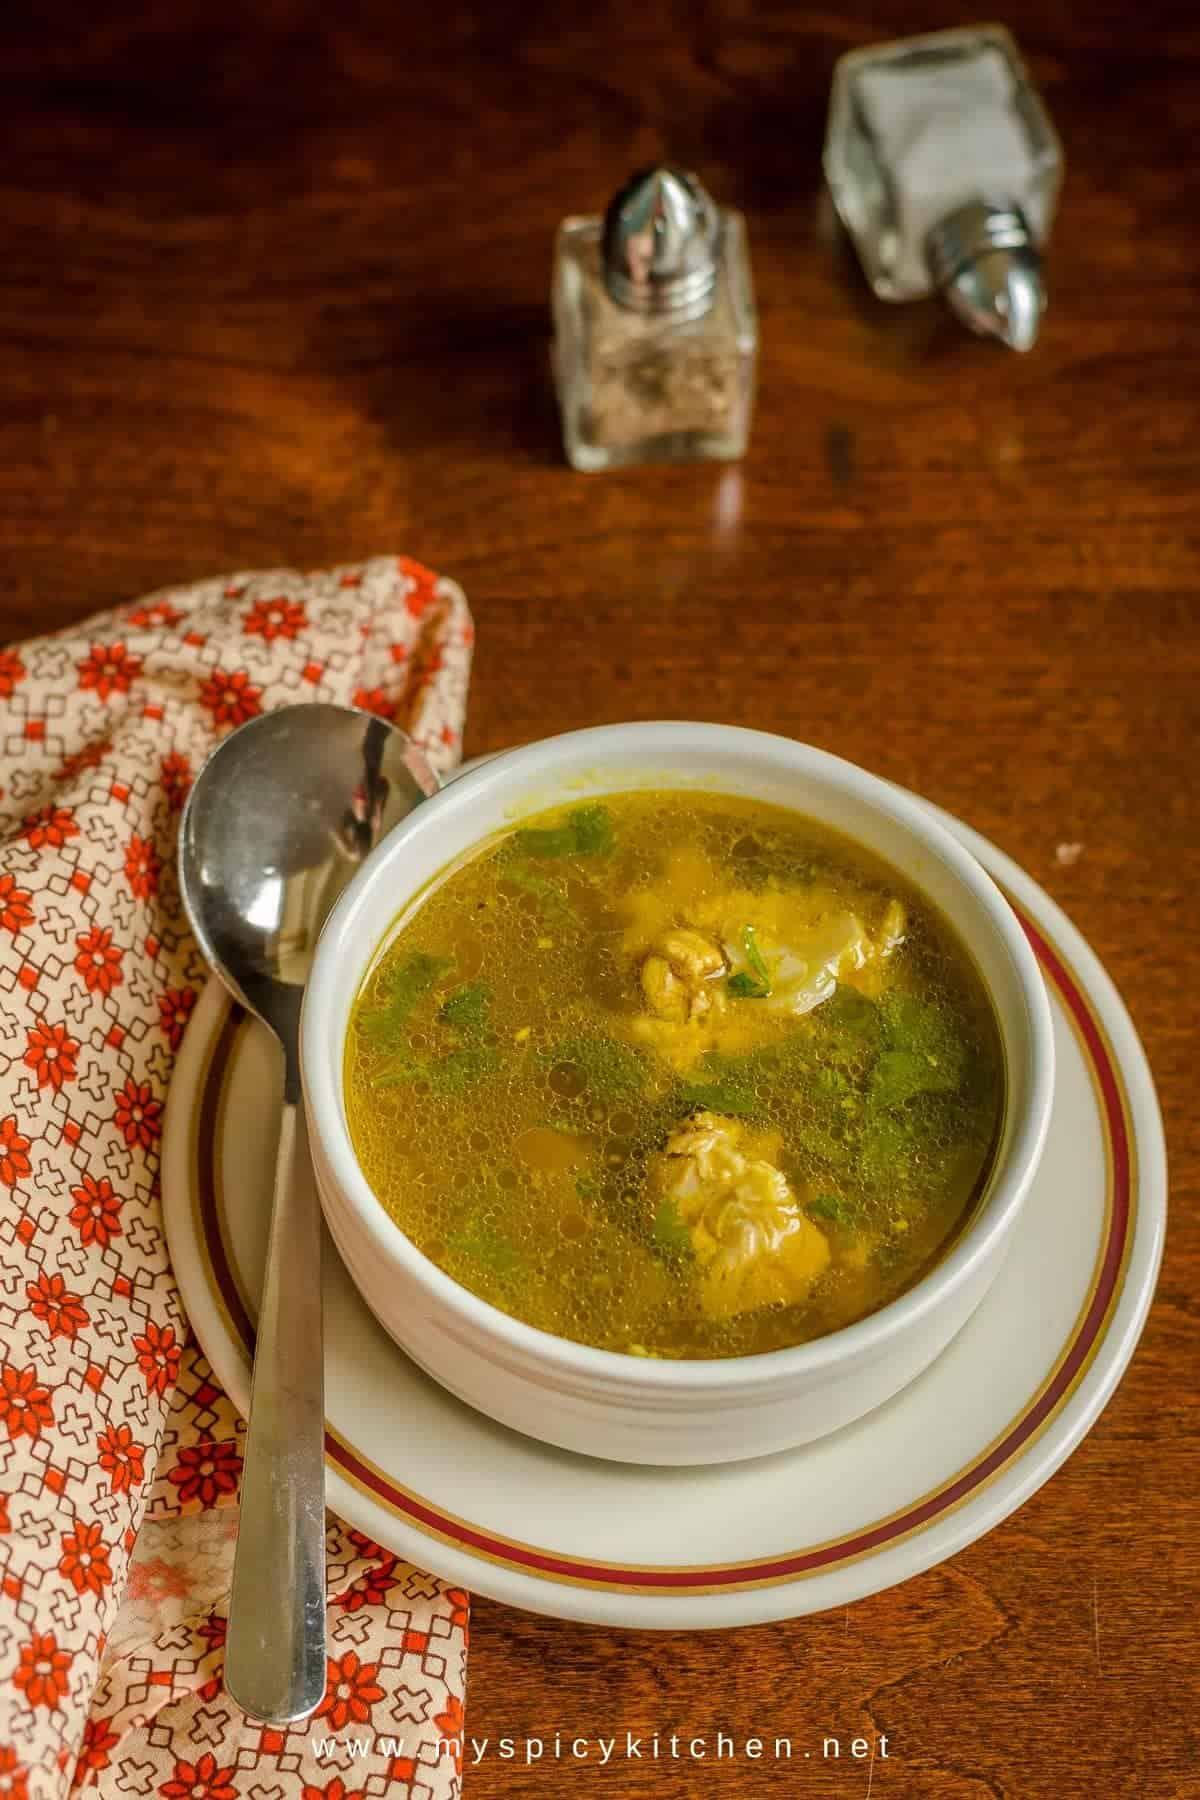 Blogging Marathon, Cooking Carnival, Protein Rich Food, Cooking With Protein Rich Ingredients, Cooking With Chicken, Indian Food, Indian Soup, Chicken Clear Soup, Desi Style Chicken Clear Soup,